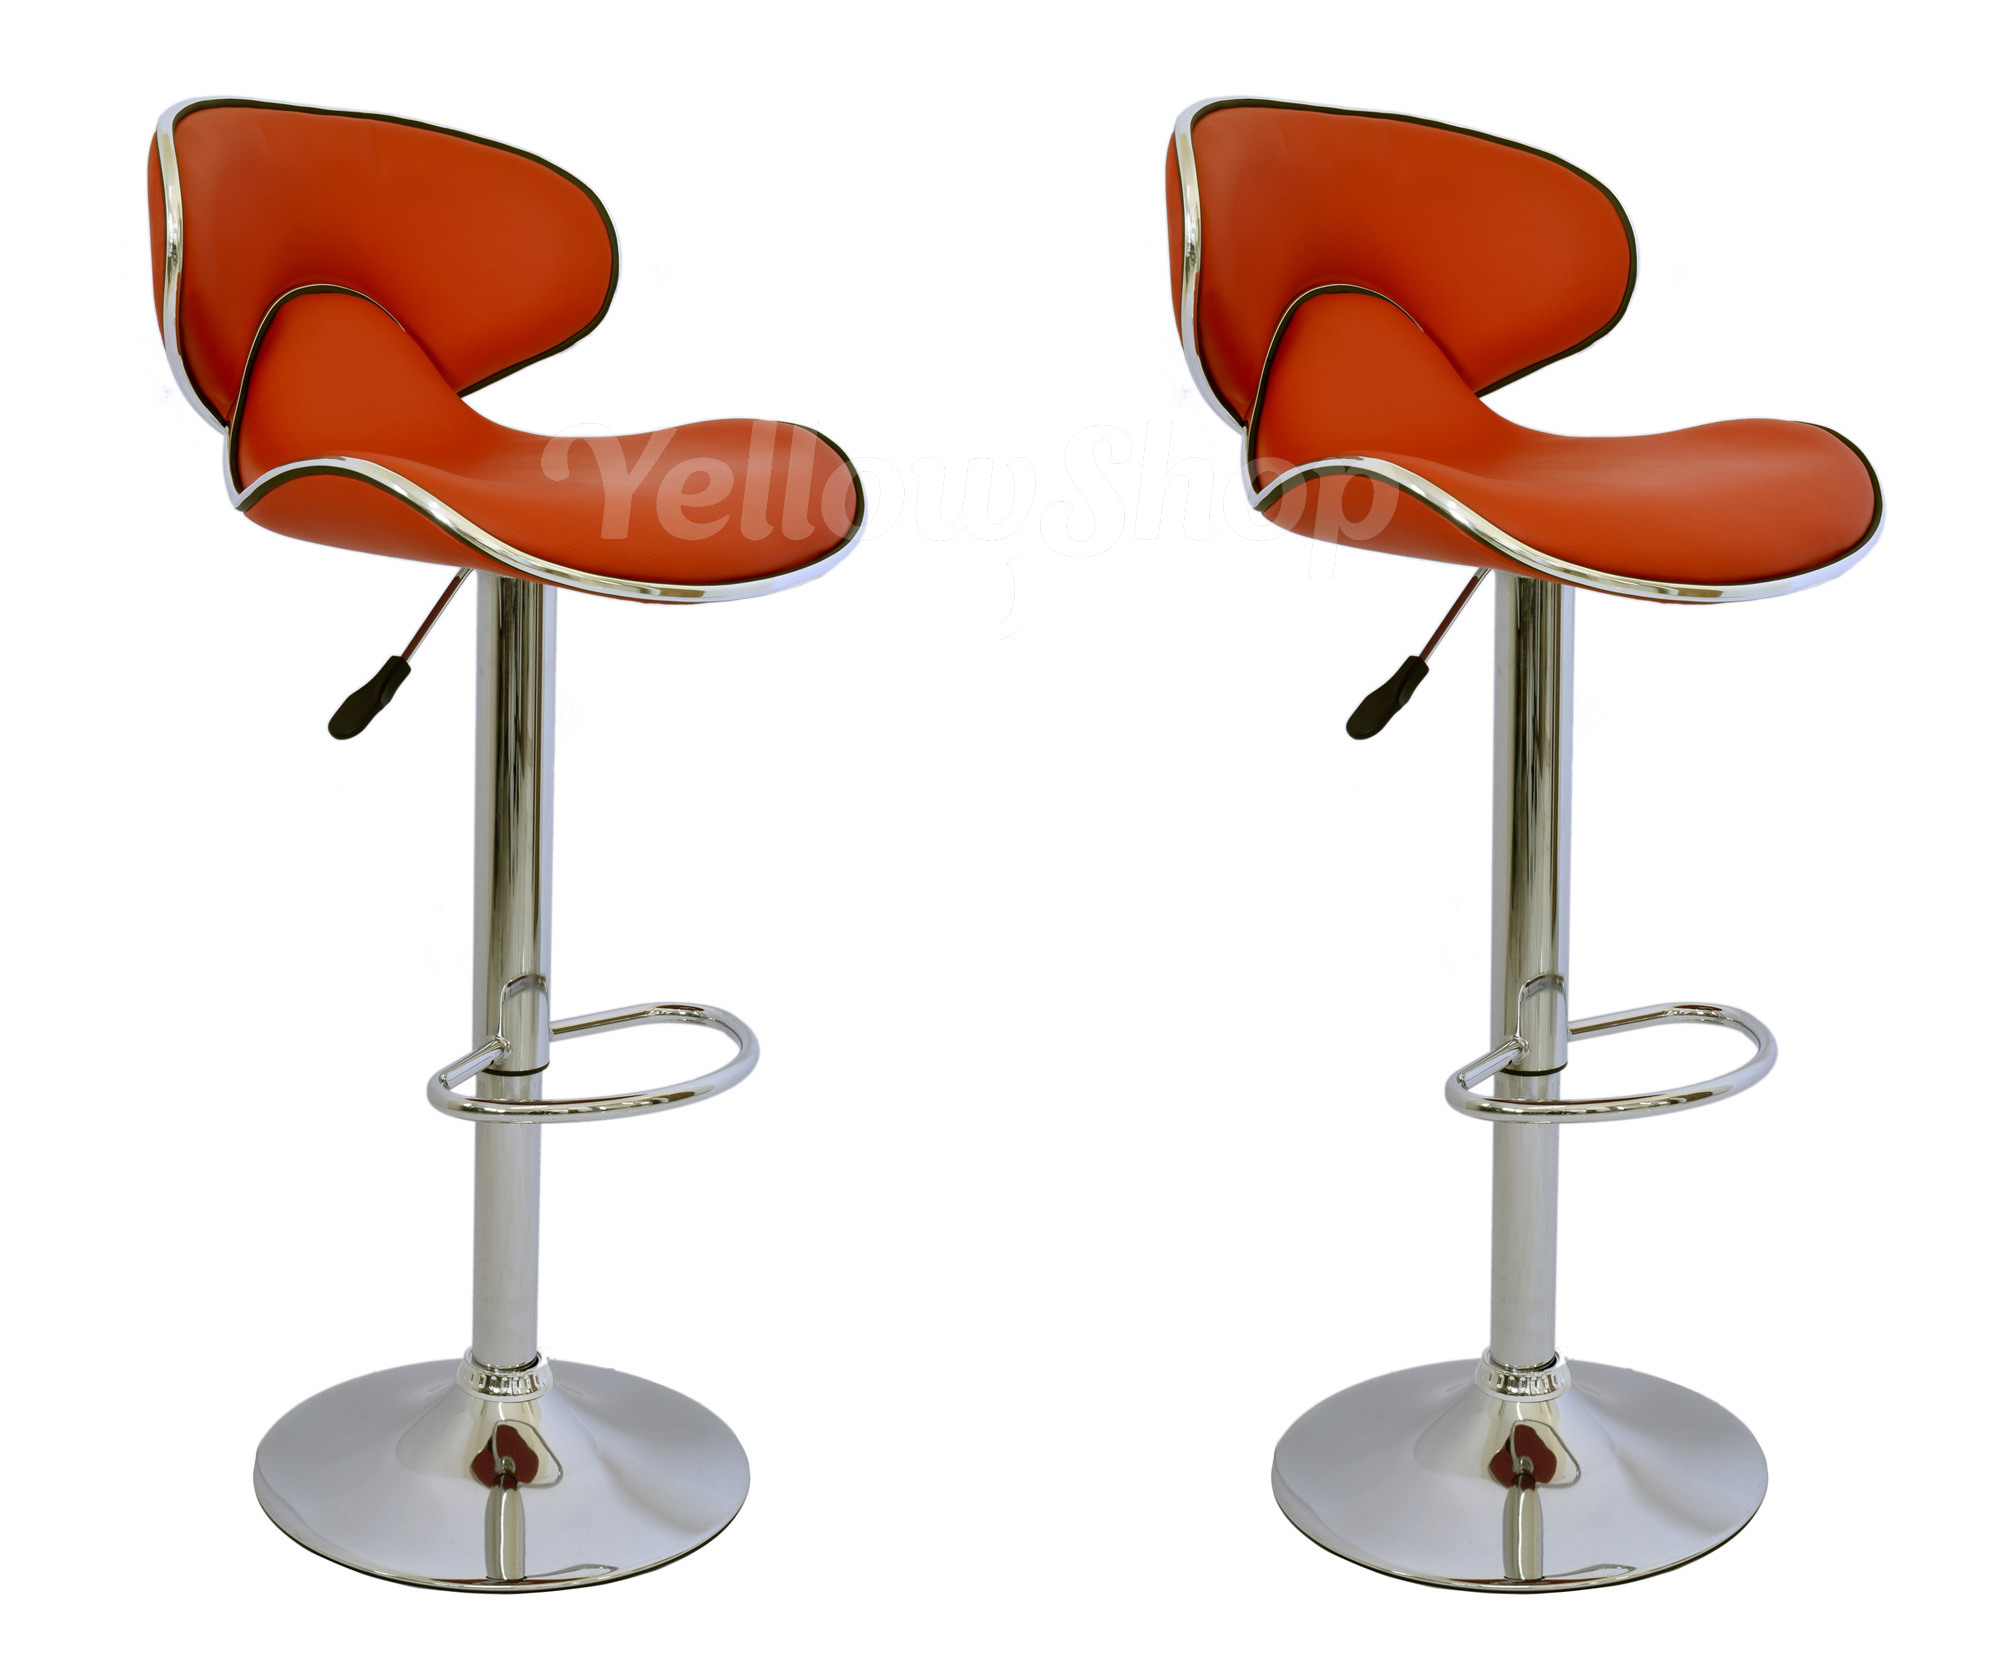 Coppia sgabelli ecopelle sgabello rosso cromo ergonomico bar cucina